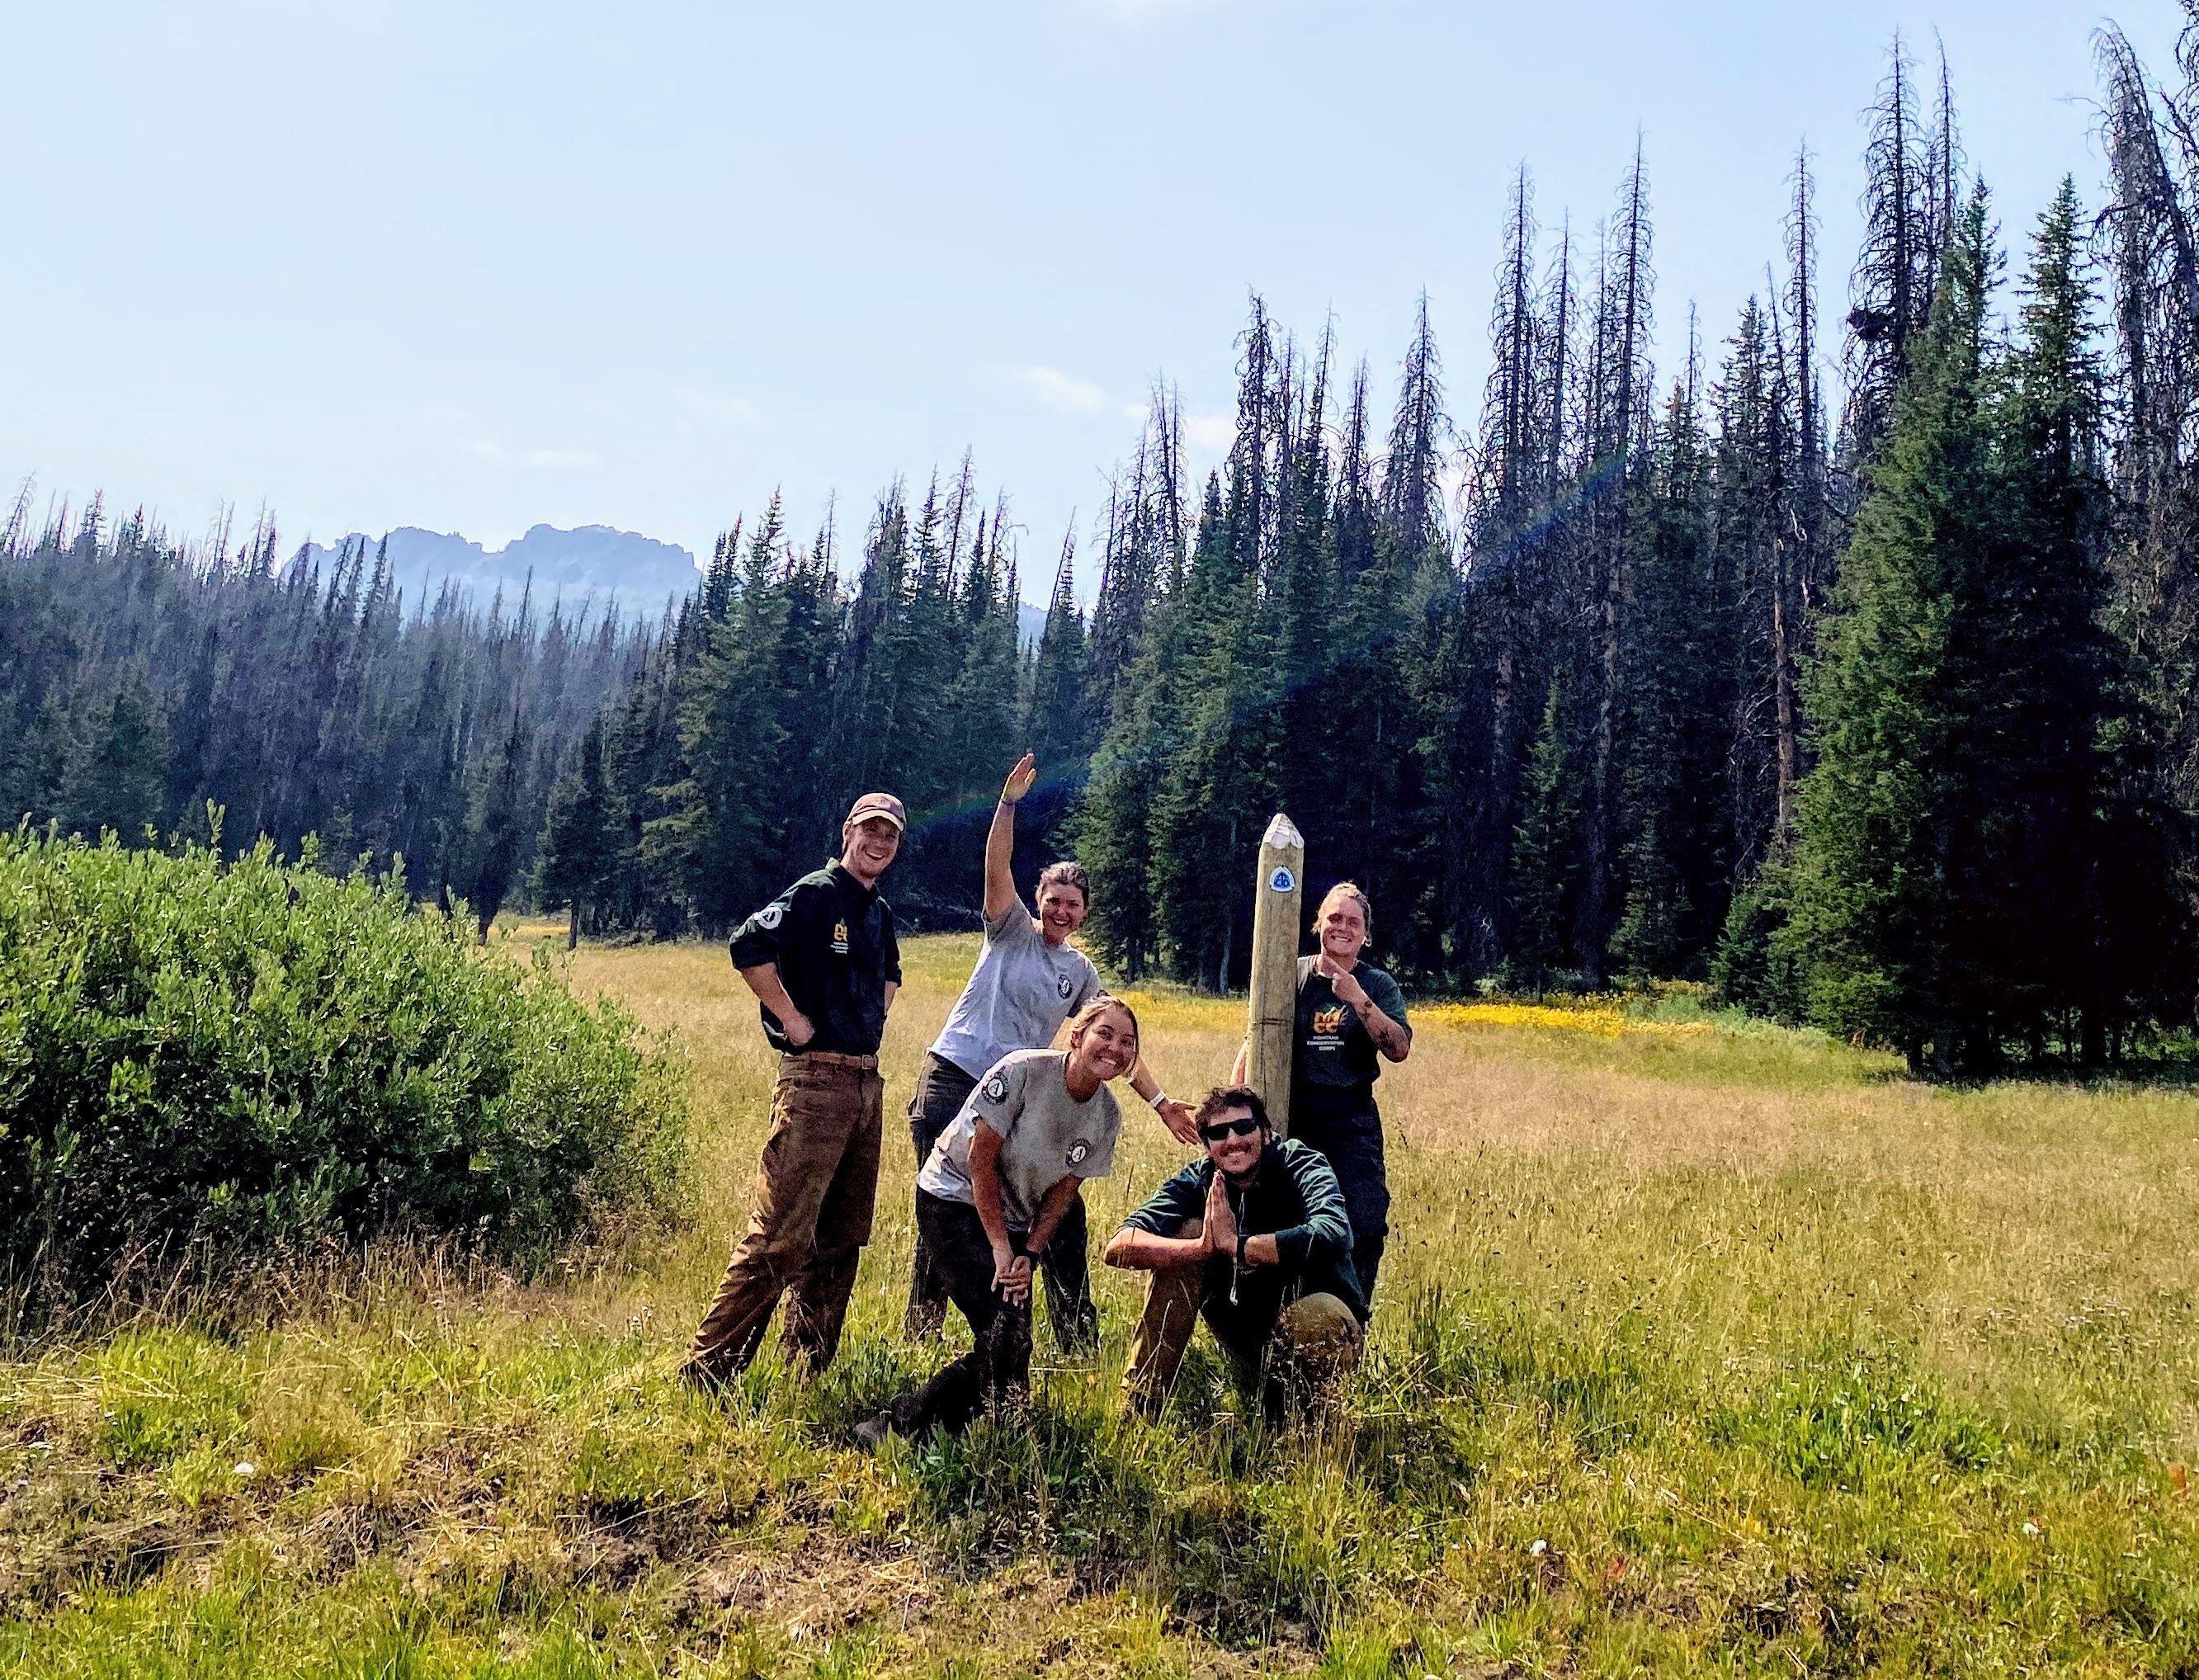 Blackrock Ranger District Continental Divide Trail